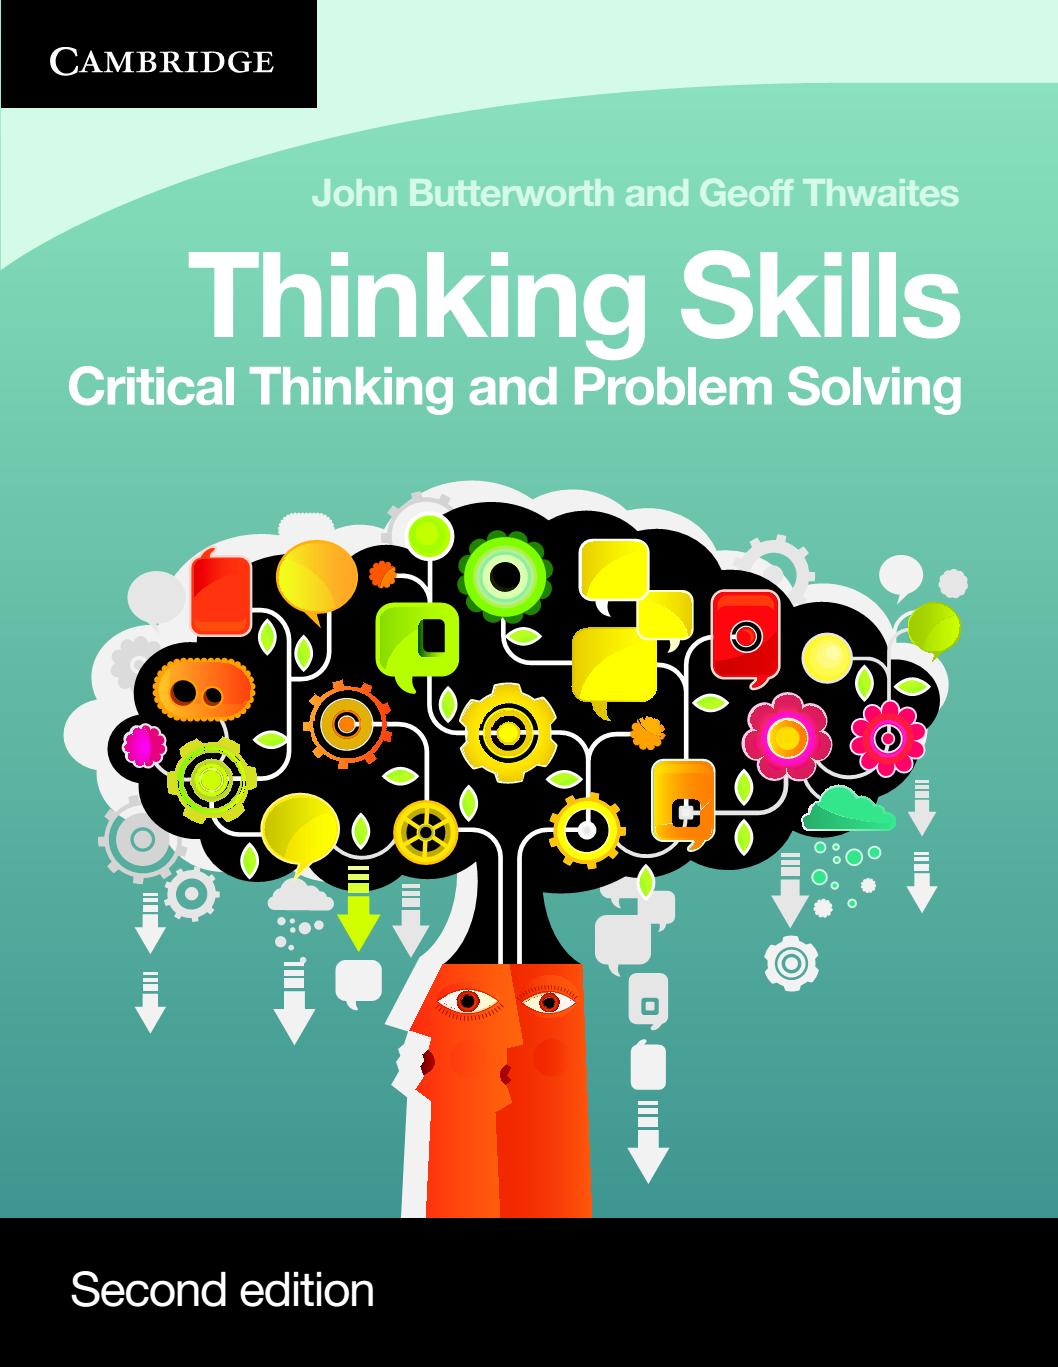 Cambridge Thinking skills by John Butterworth